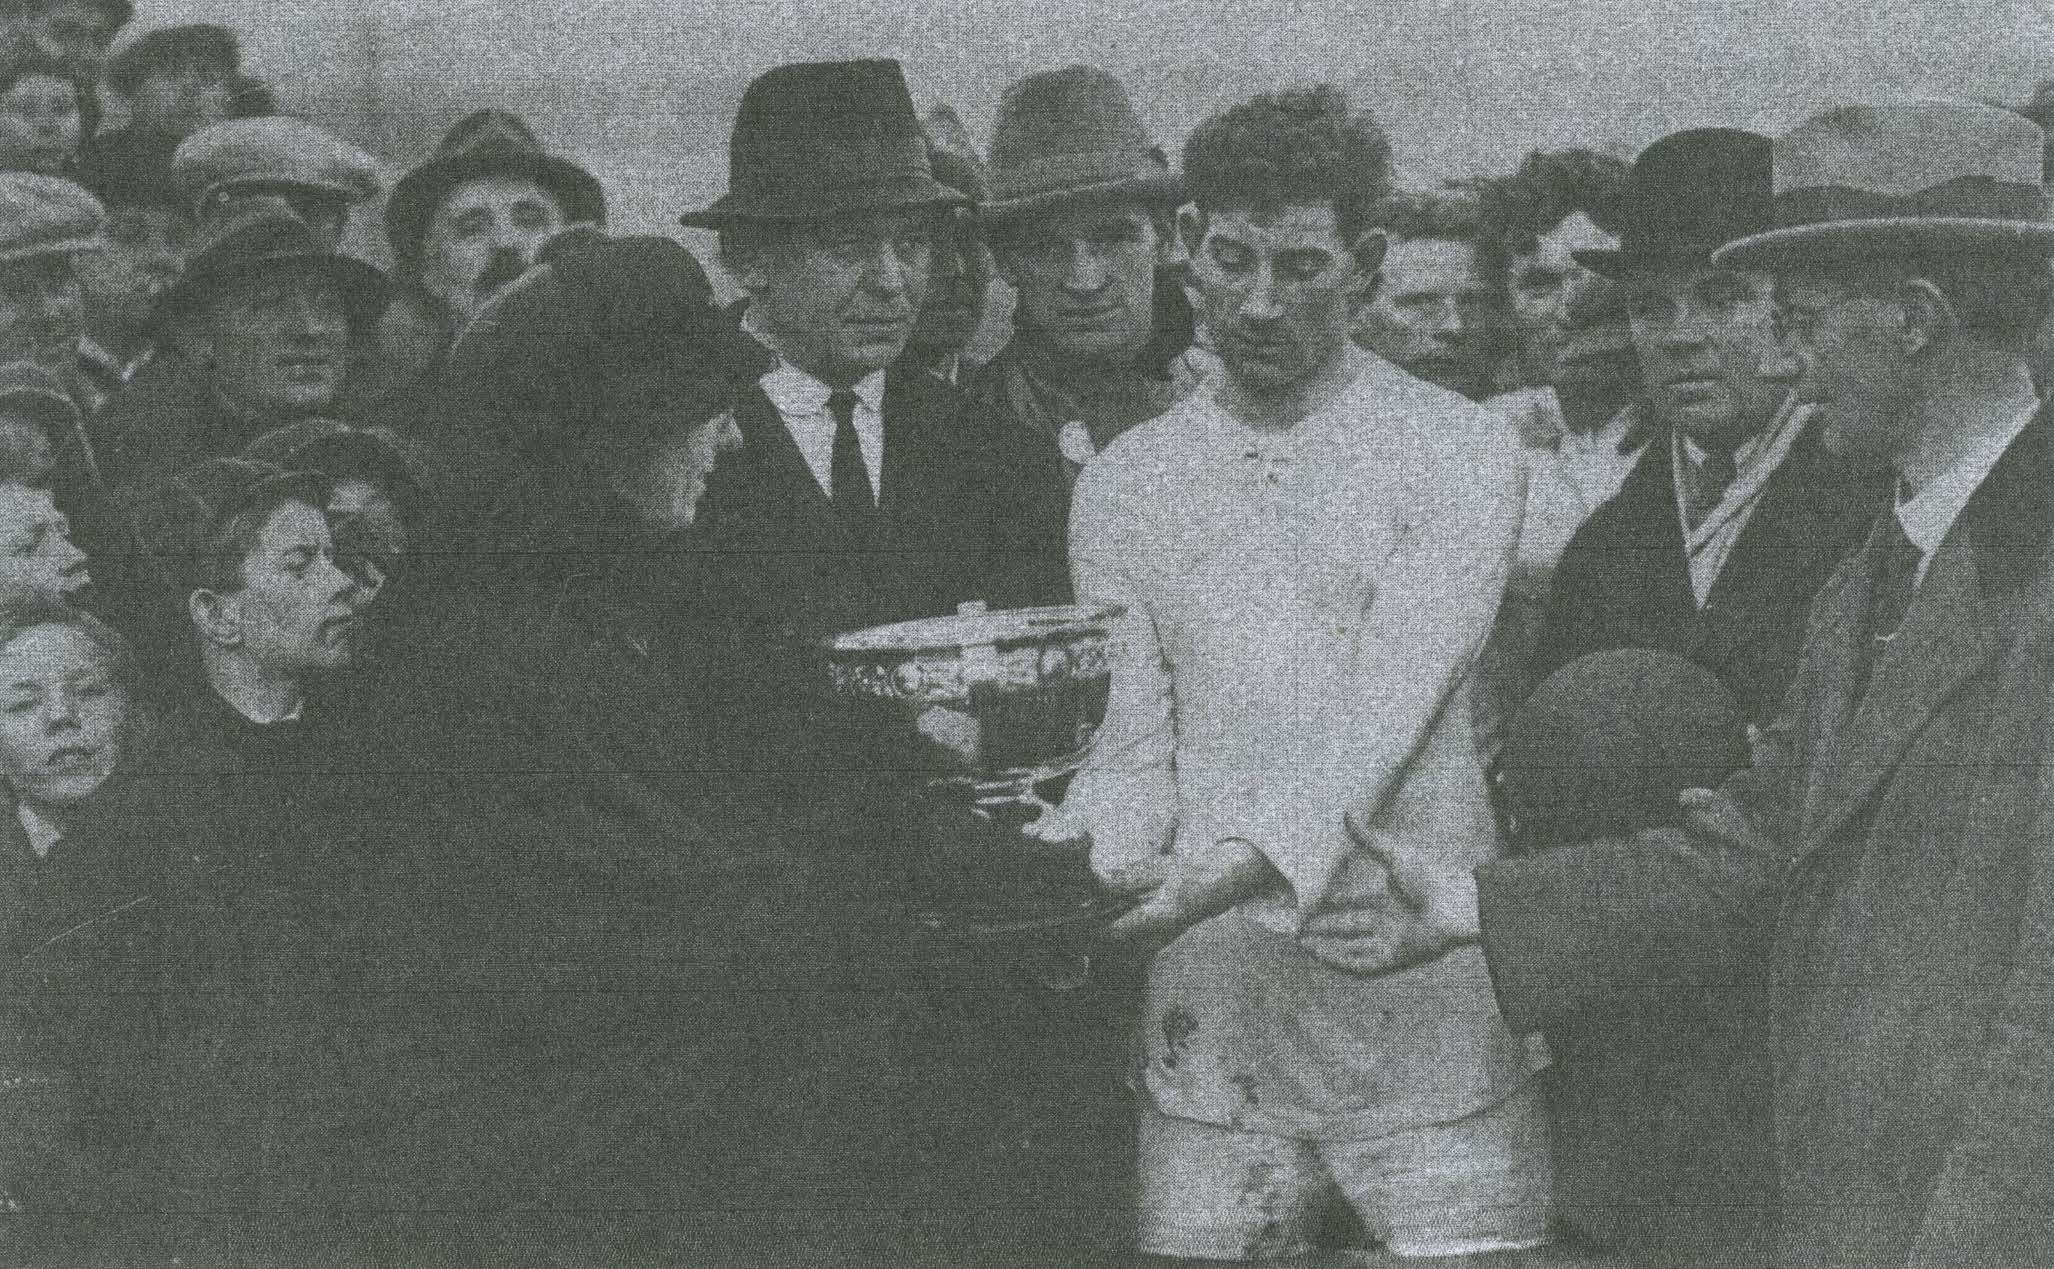 Kathleen Clarke presenting the IRPDF Cup to George Higgins, 1922